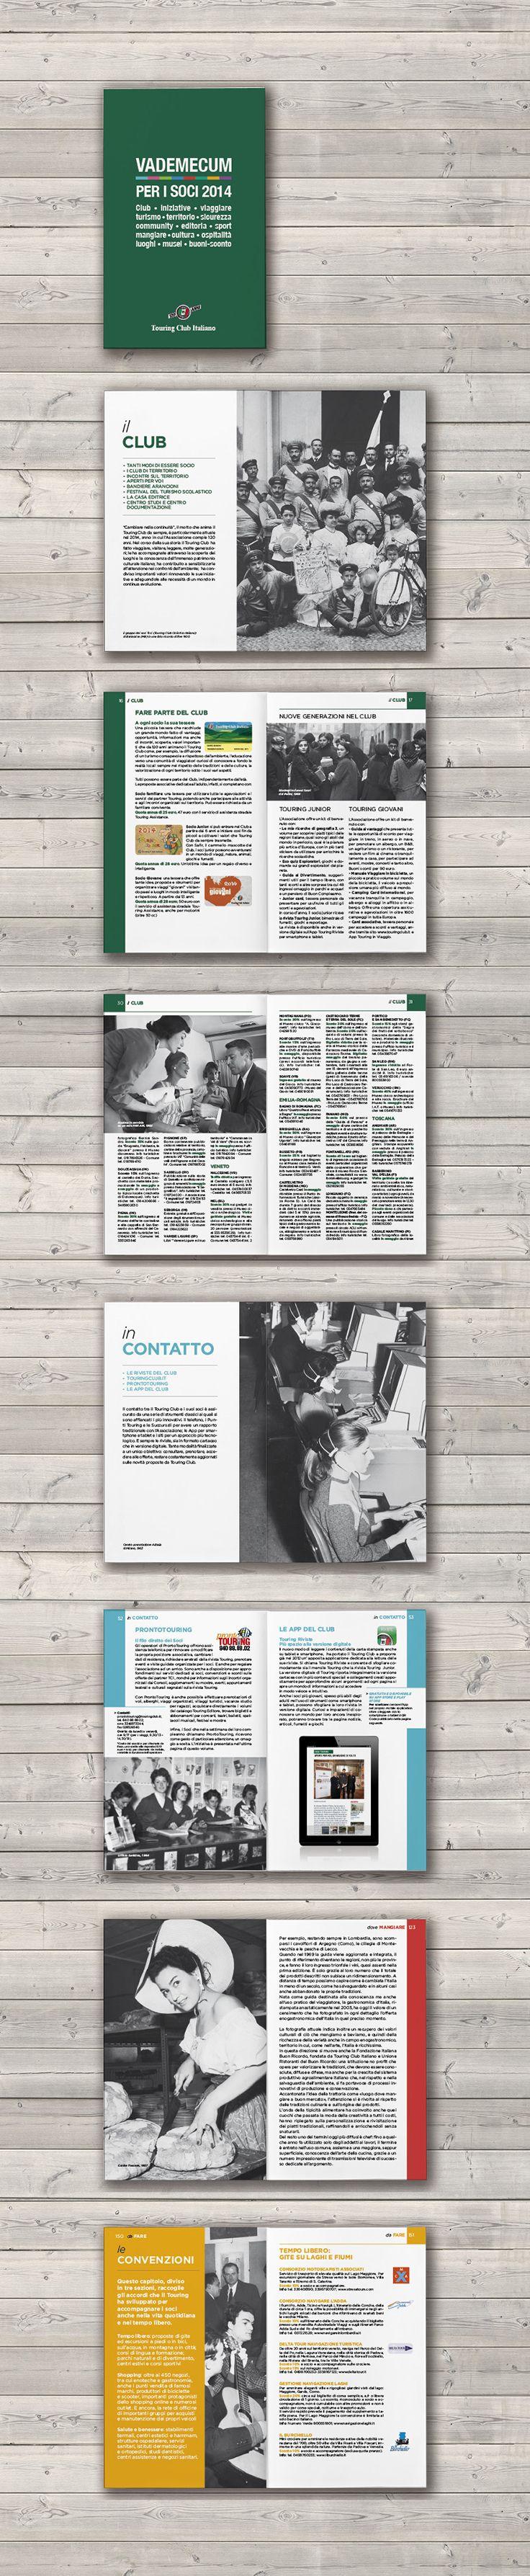 Book design / TCI Offer guide / Touring Editore